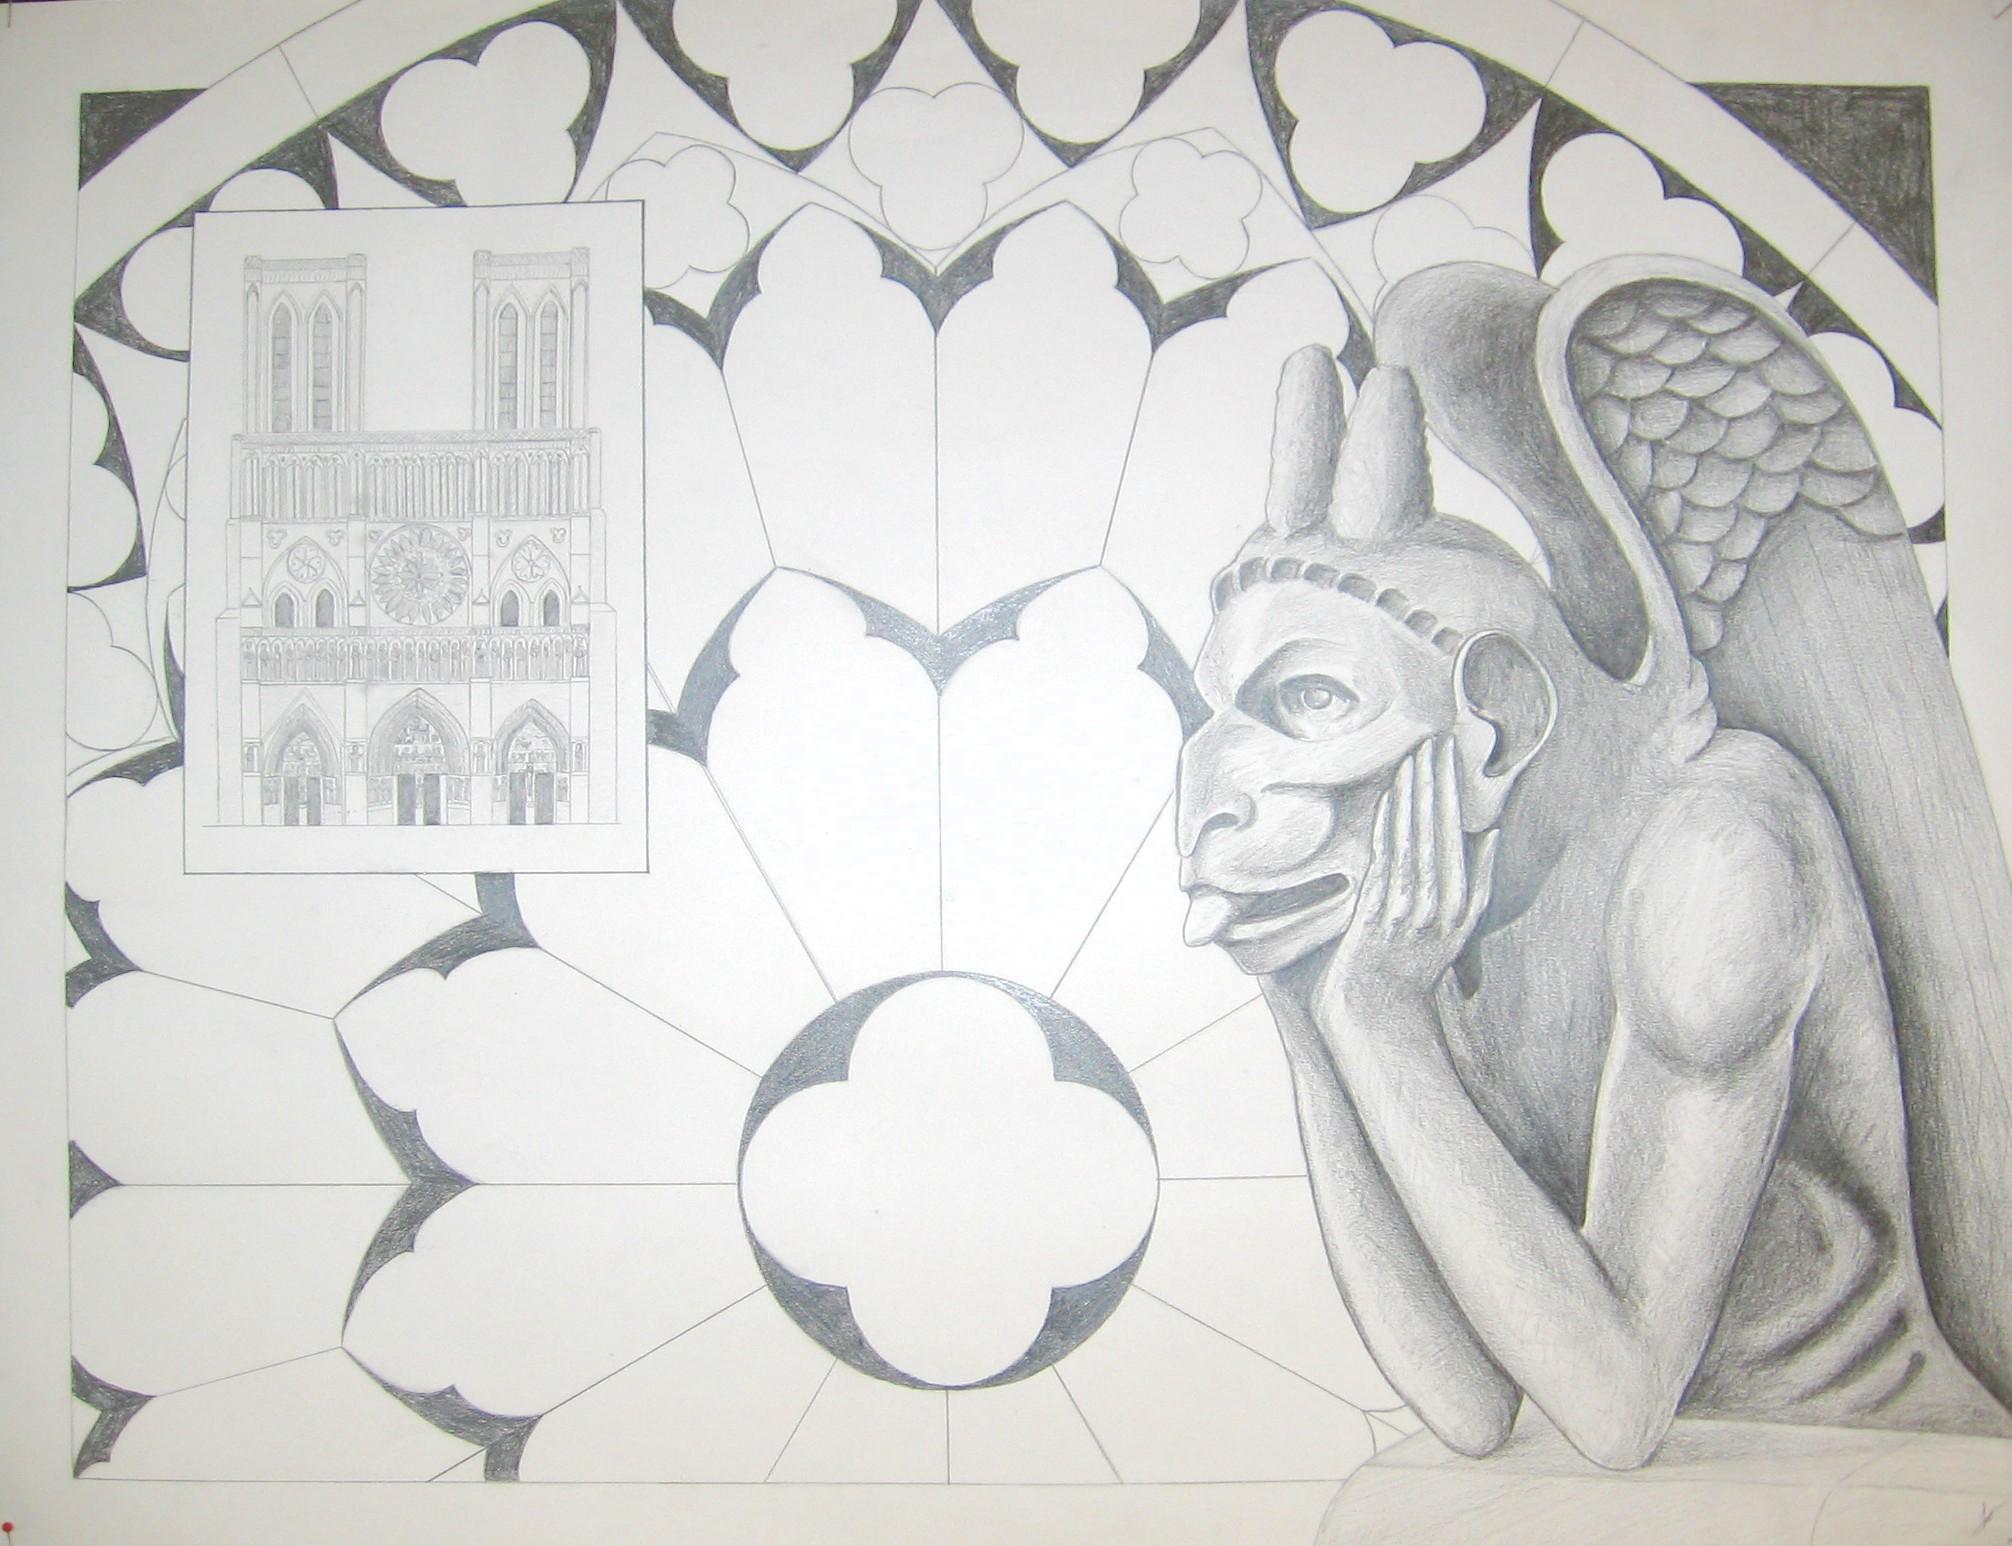 Eindwerkstuk n.a.v. de Notre Dame in Parijs